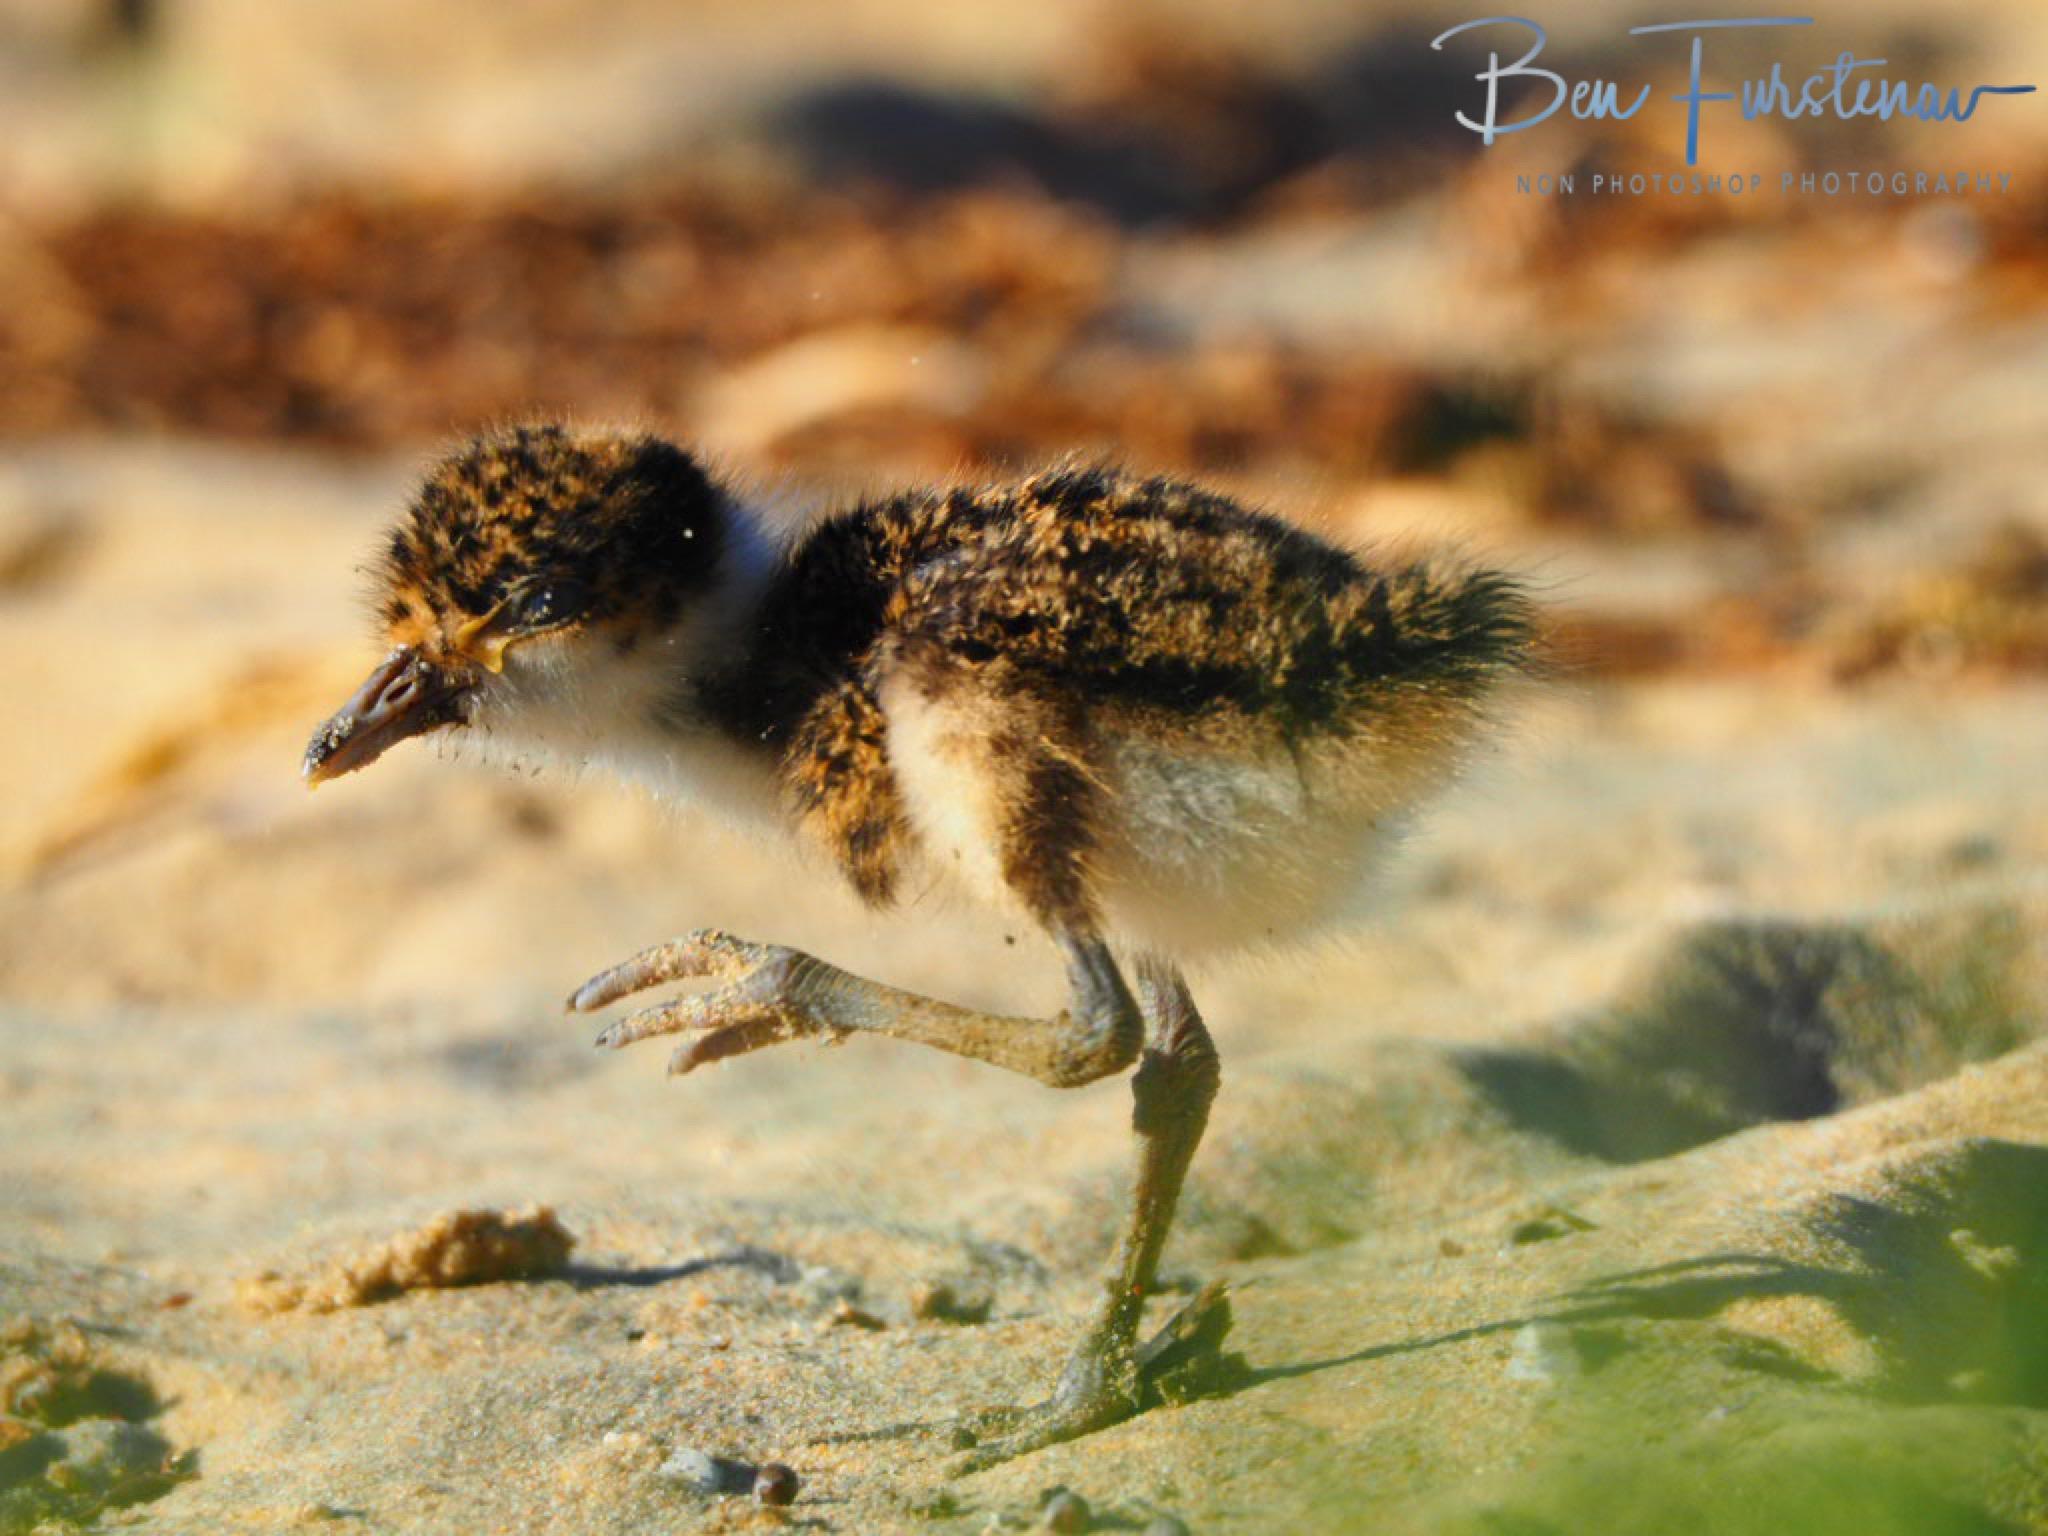 Like their parents @ Deception Bay, South-East Queensland, Australia